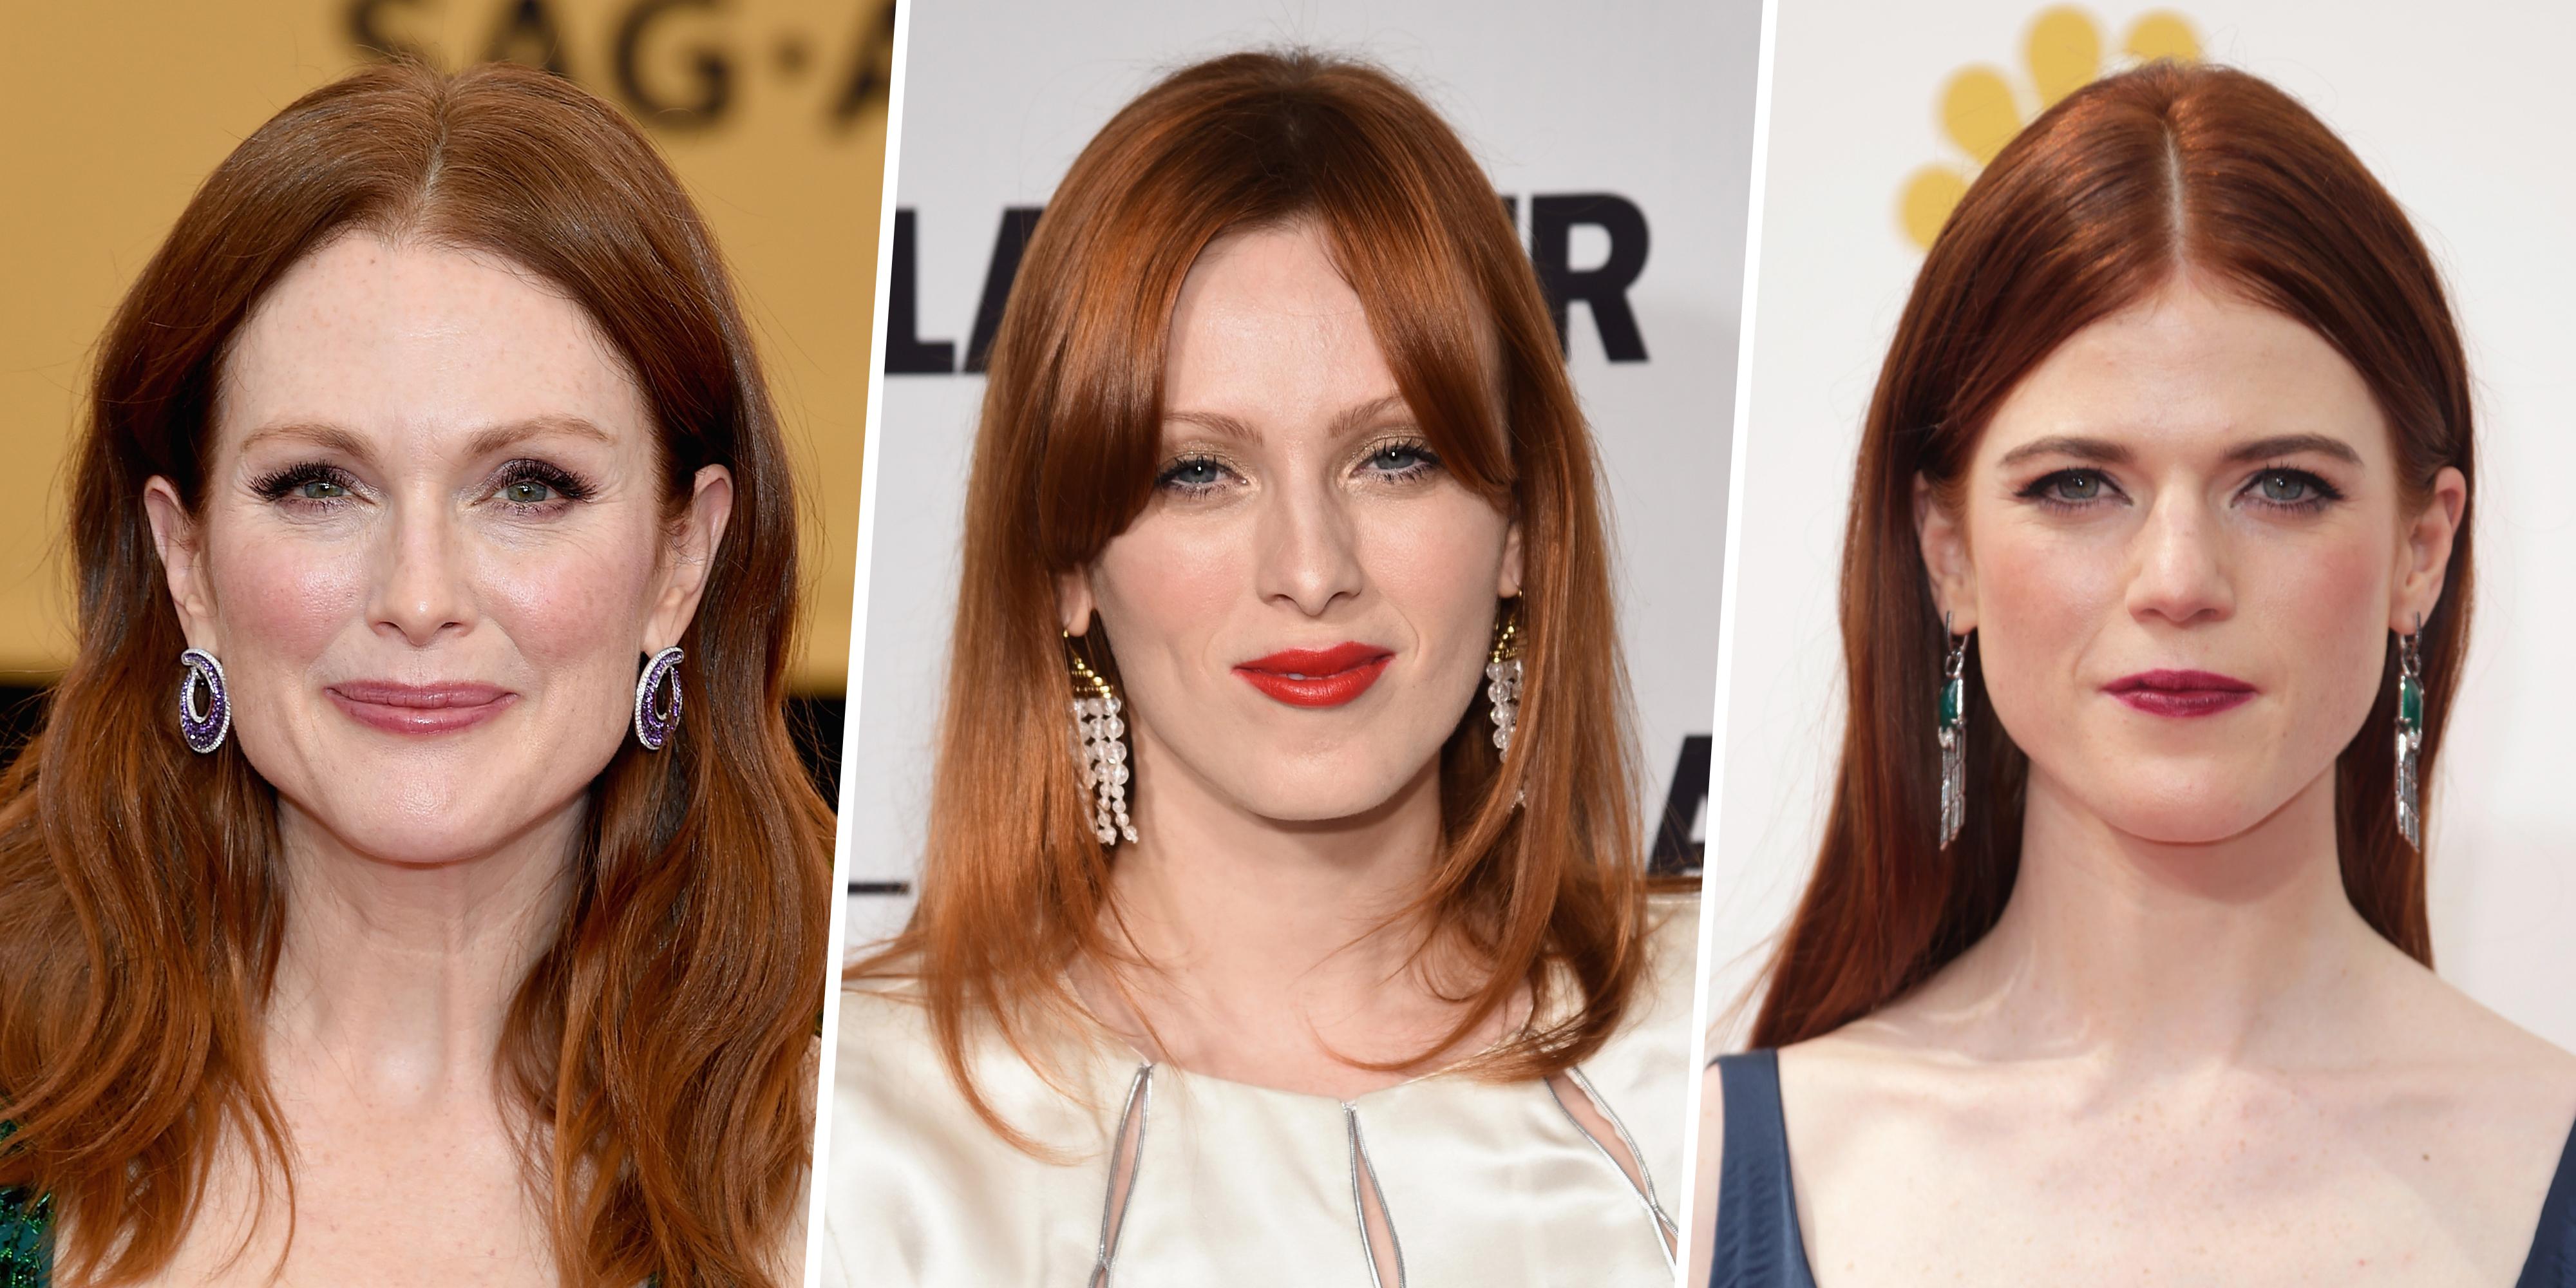 She hot! hair highlights redhead